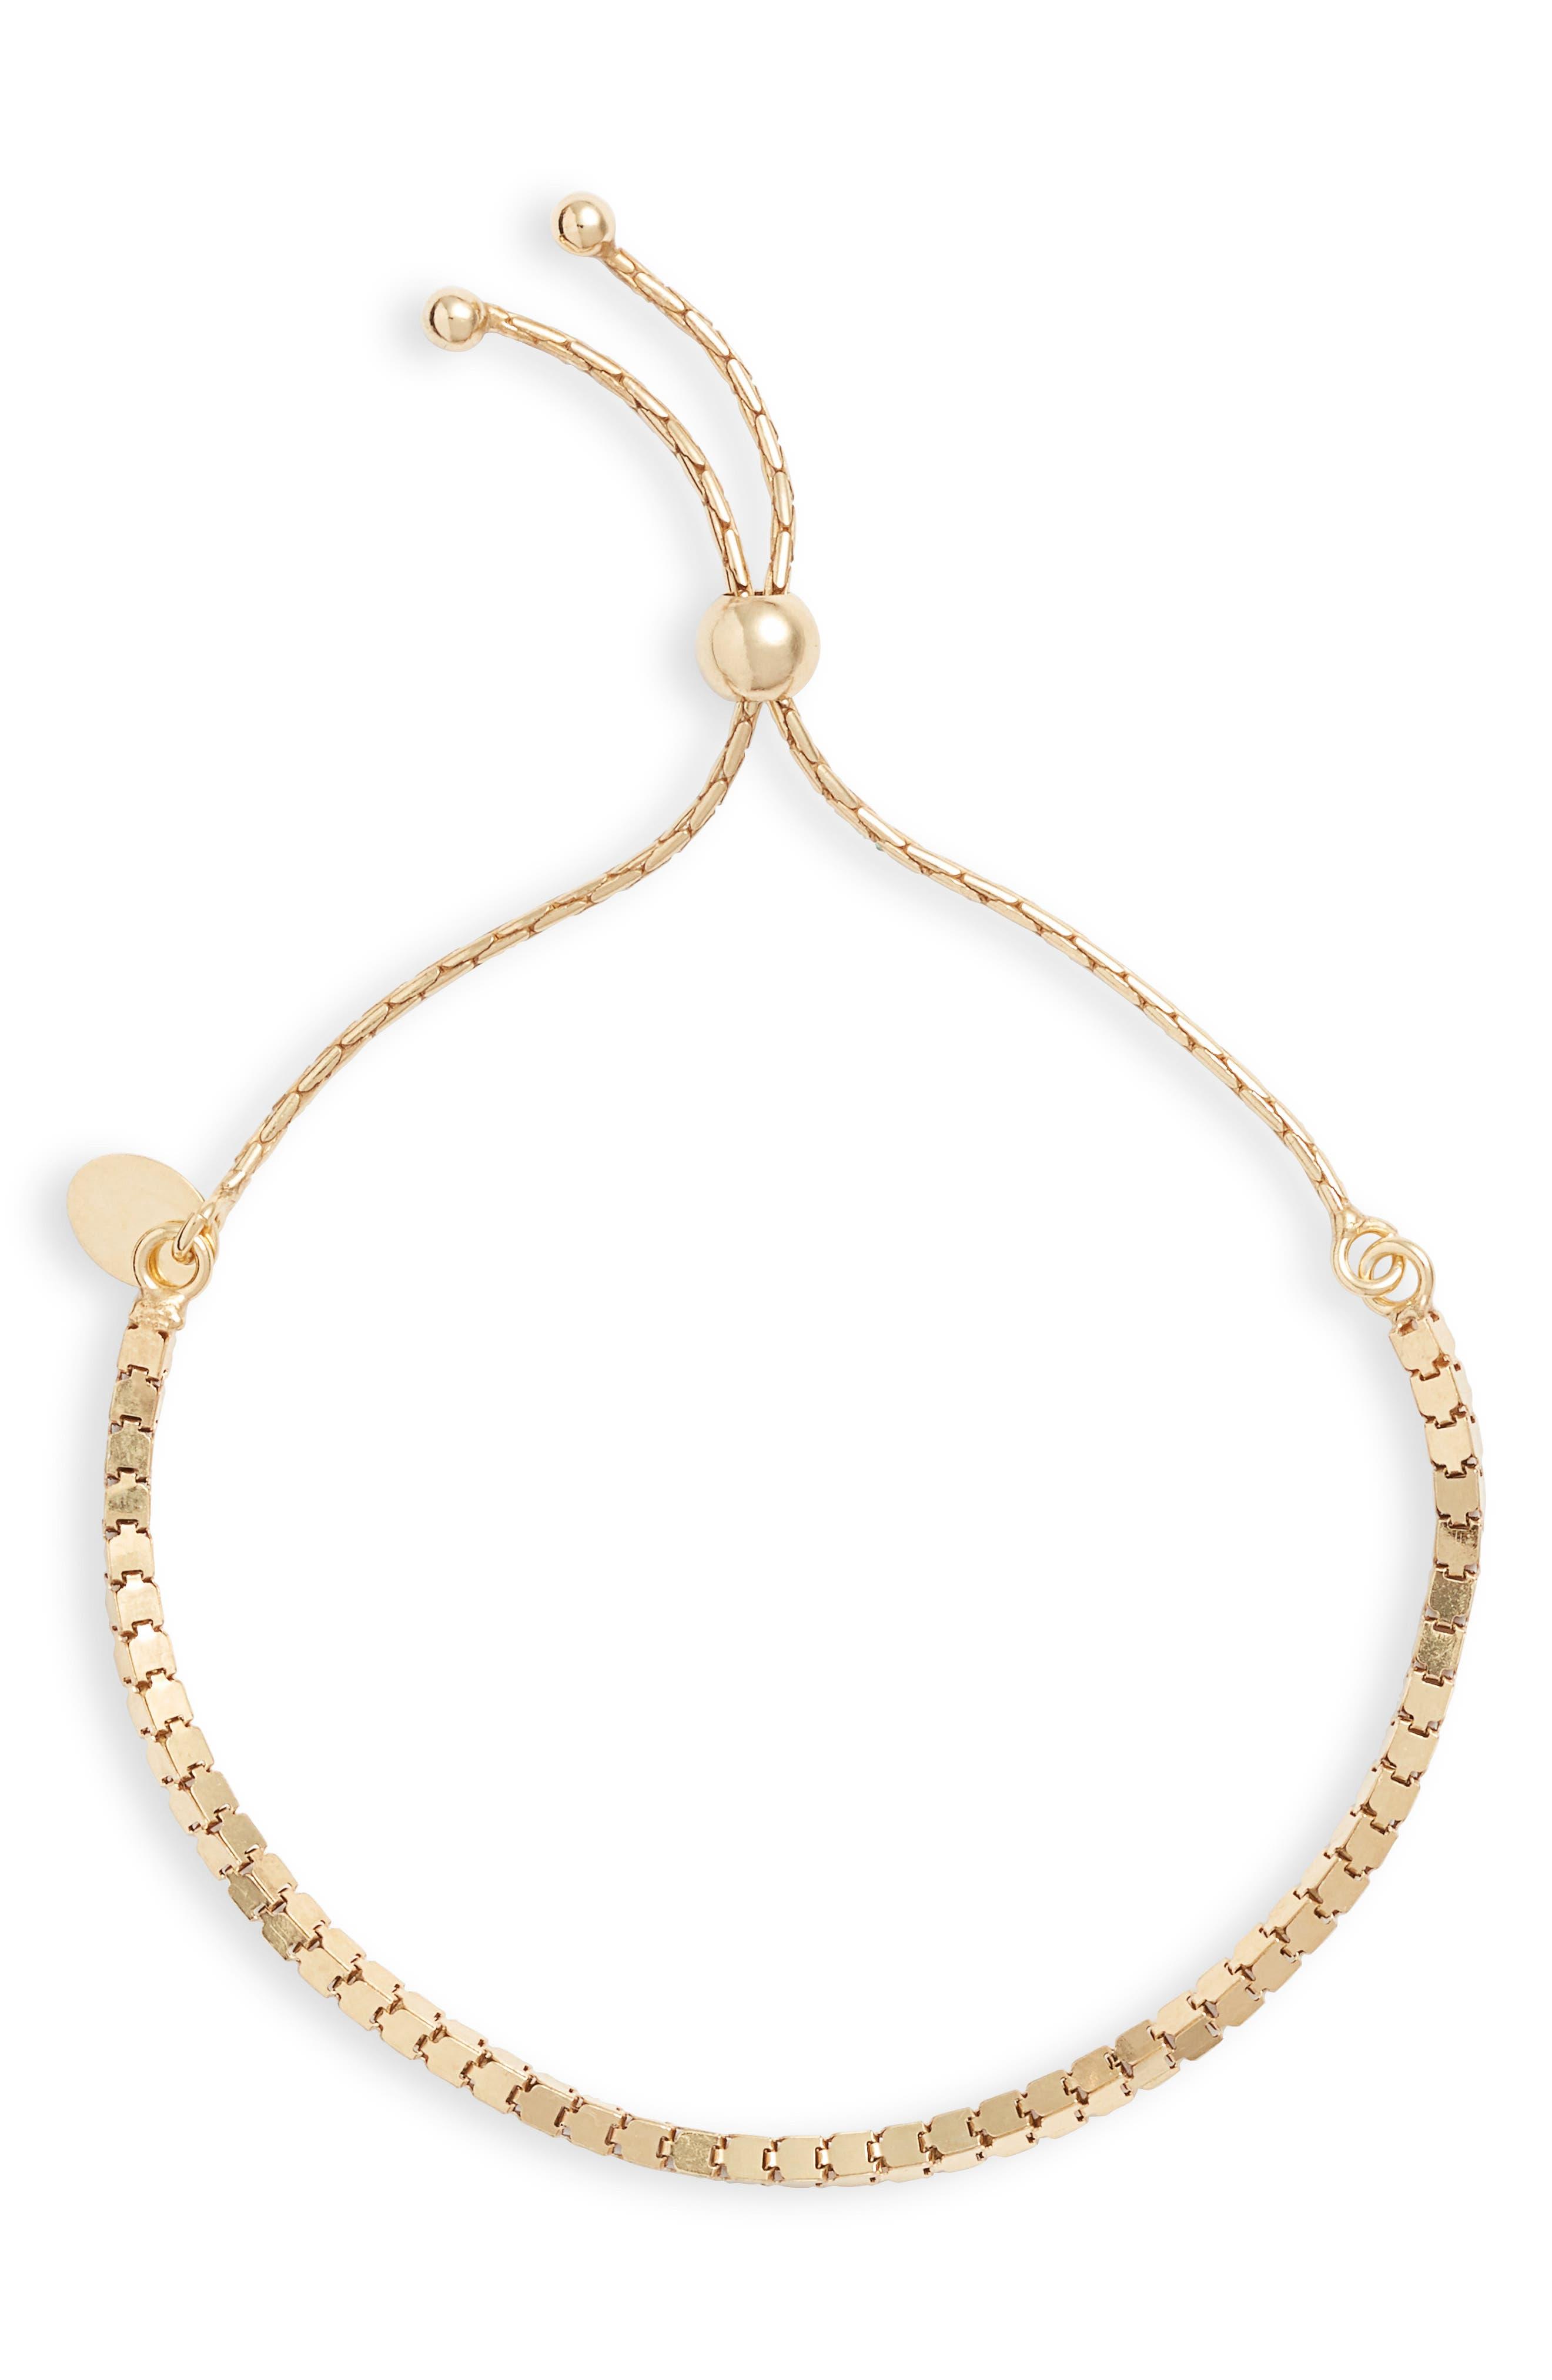 Box Chain Adjustable Slider Bracelet,                             Main thumbnail 1, color,                             GOLD